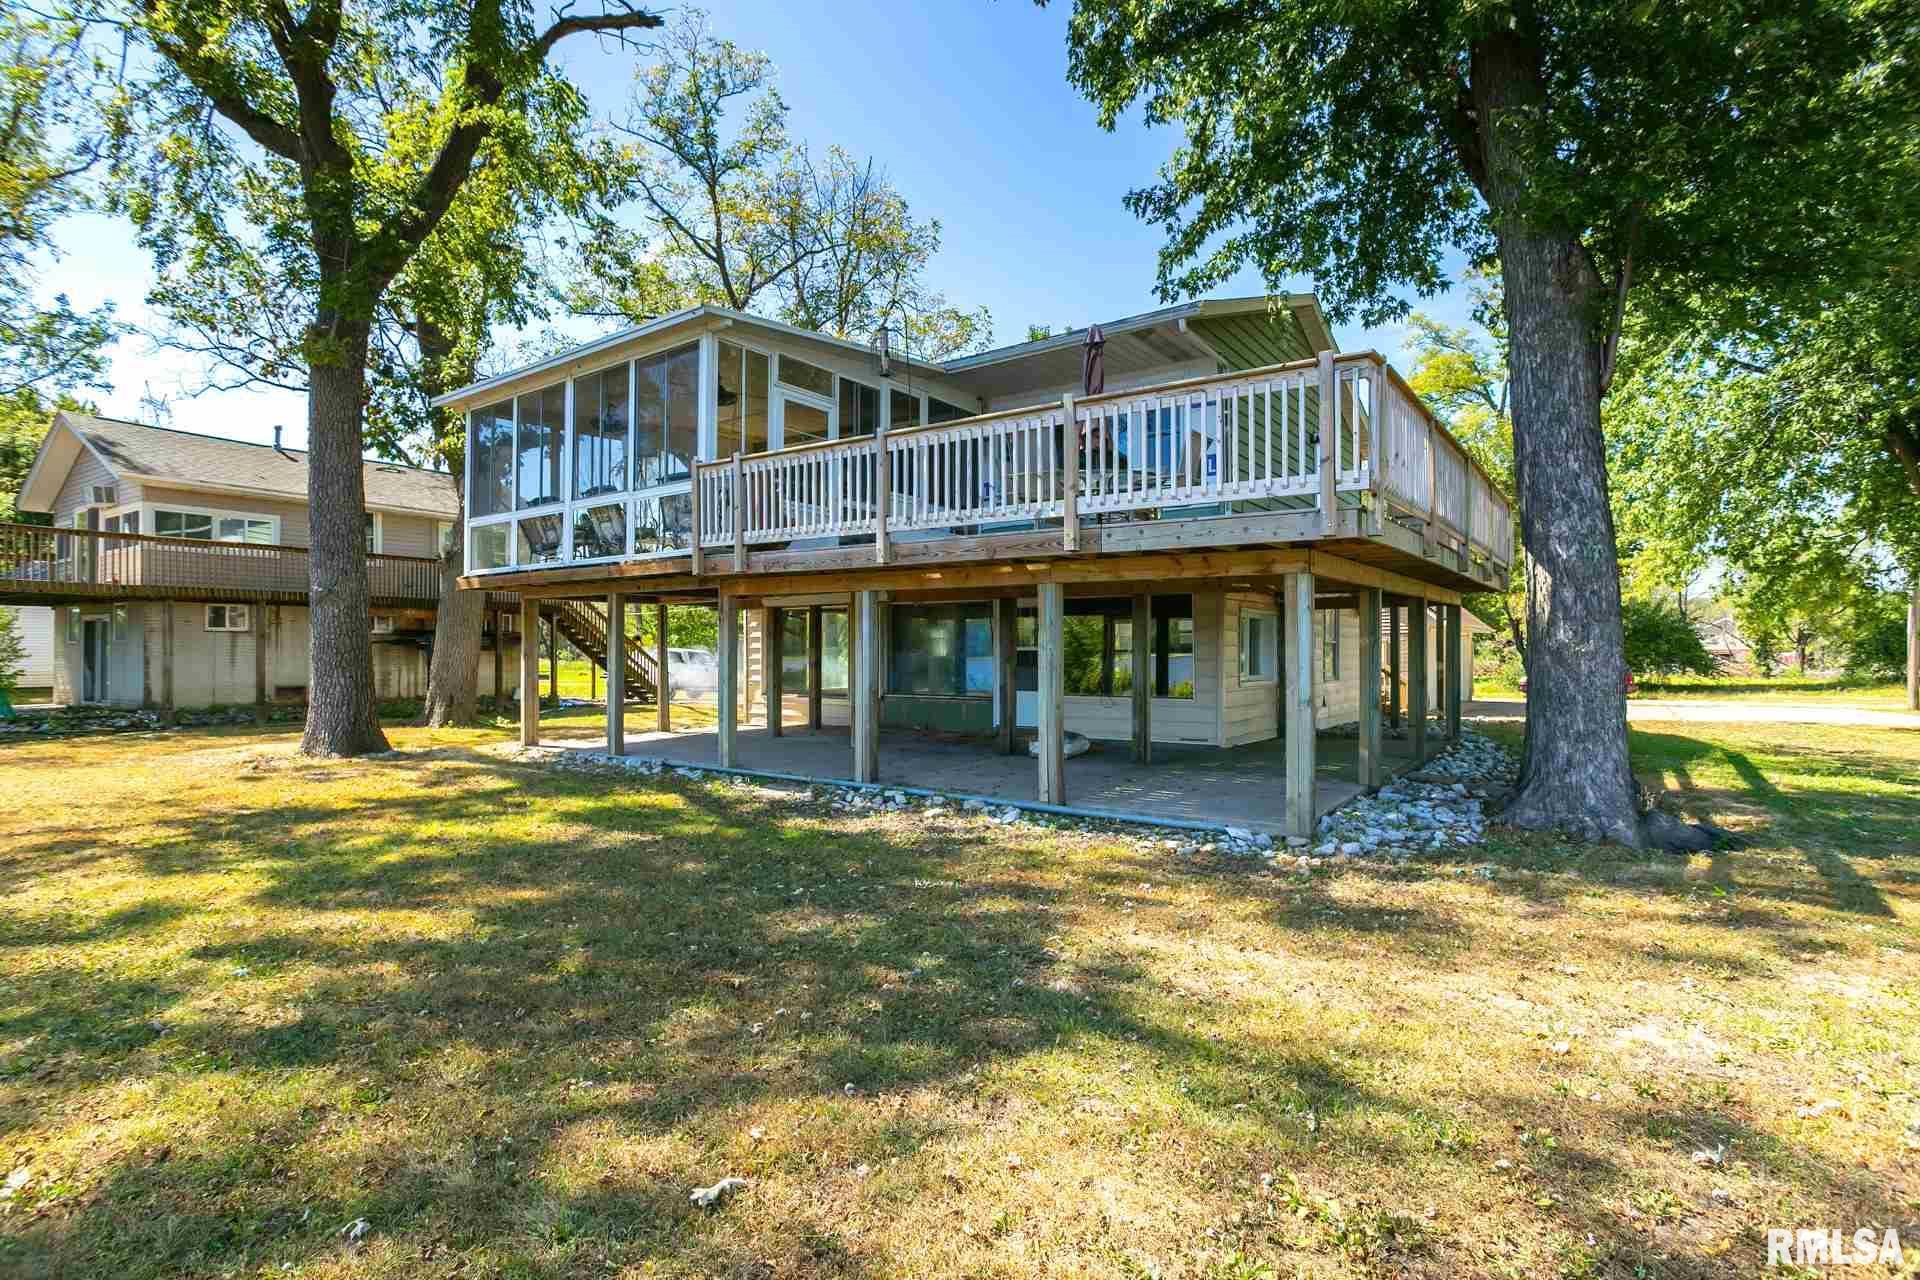 4523 S CONCORD Property Photo - Davenport, IA real estate listing